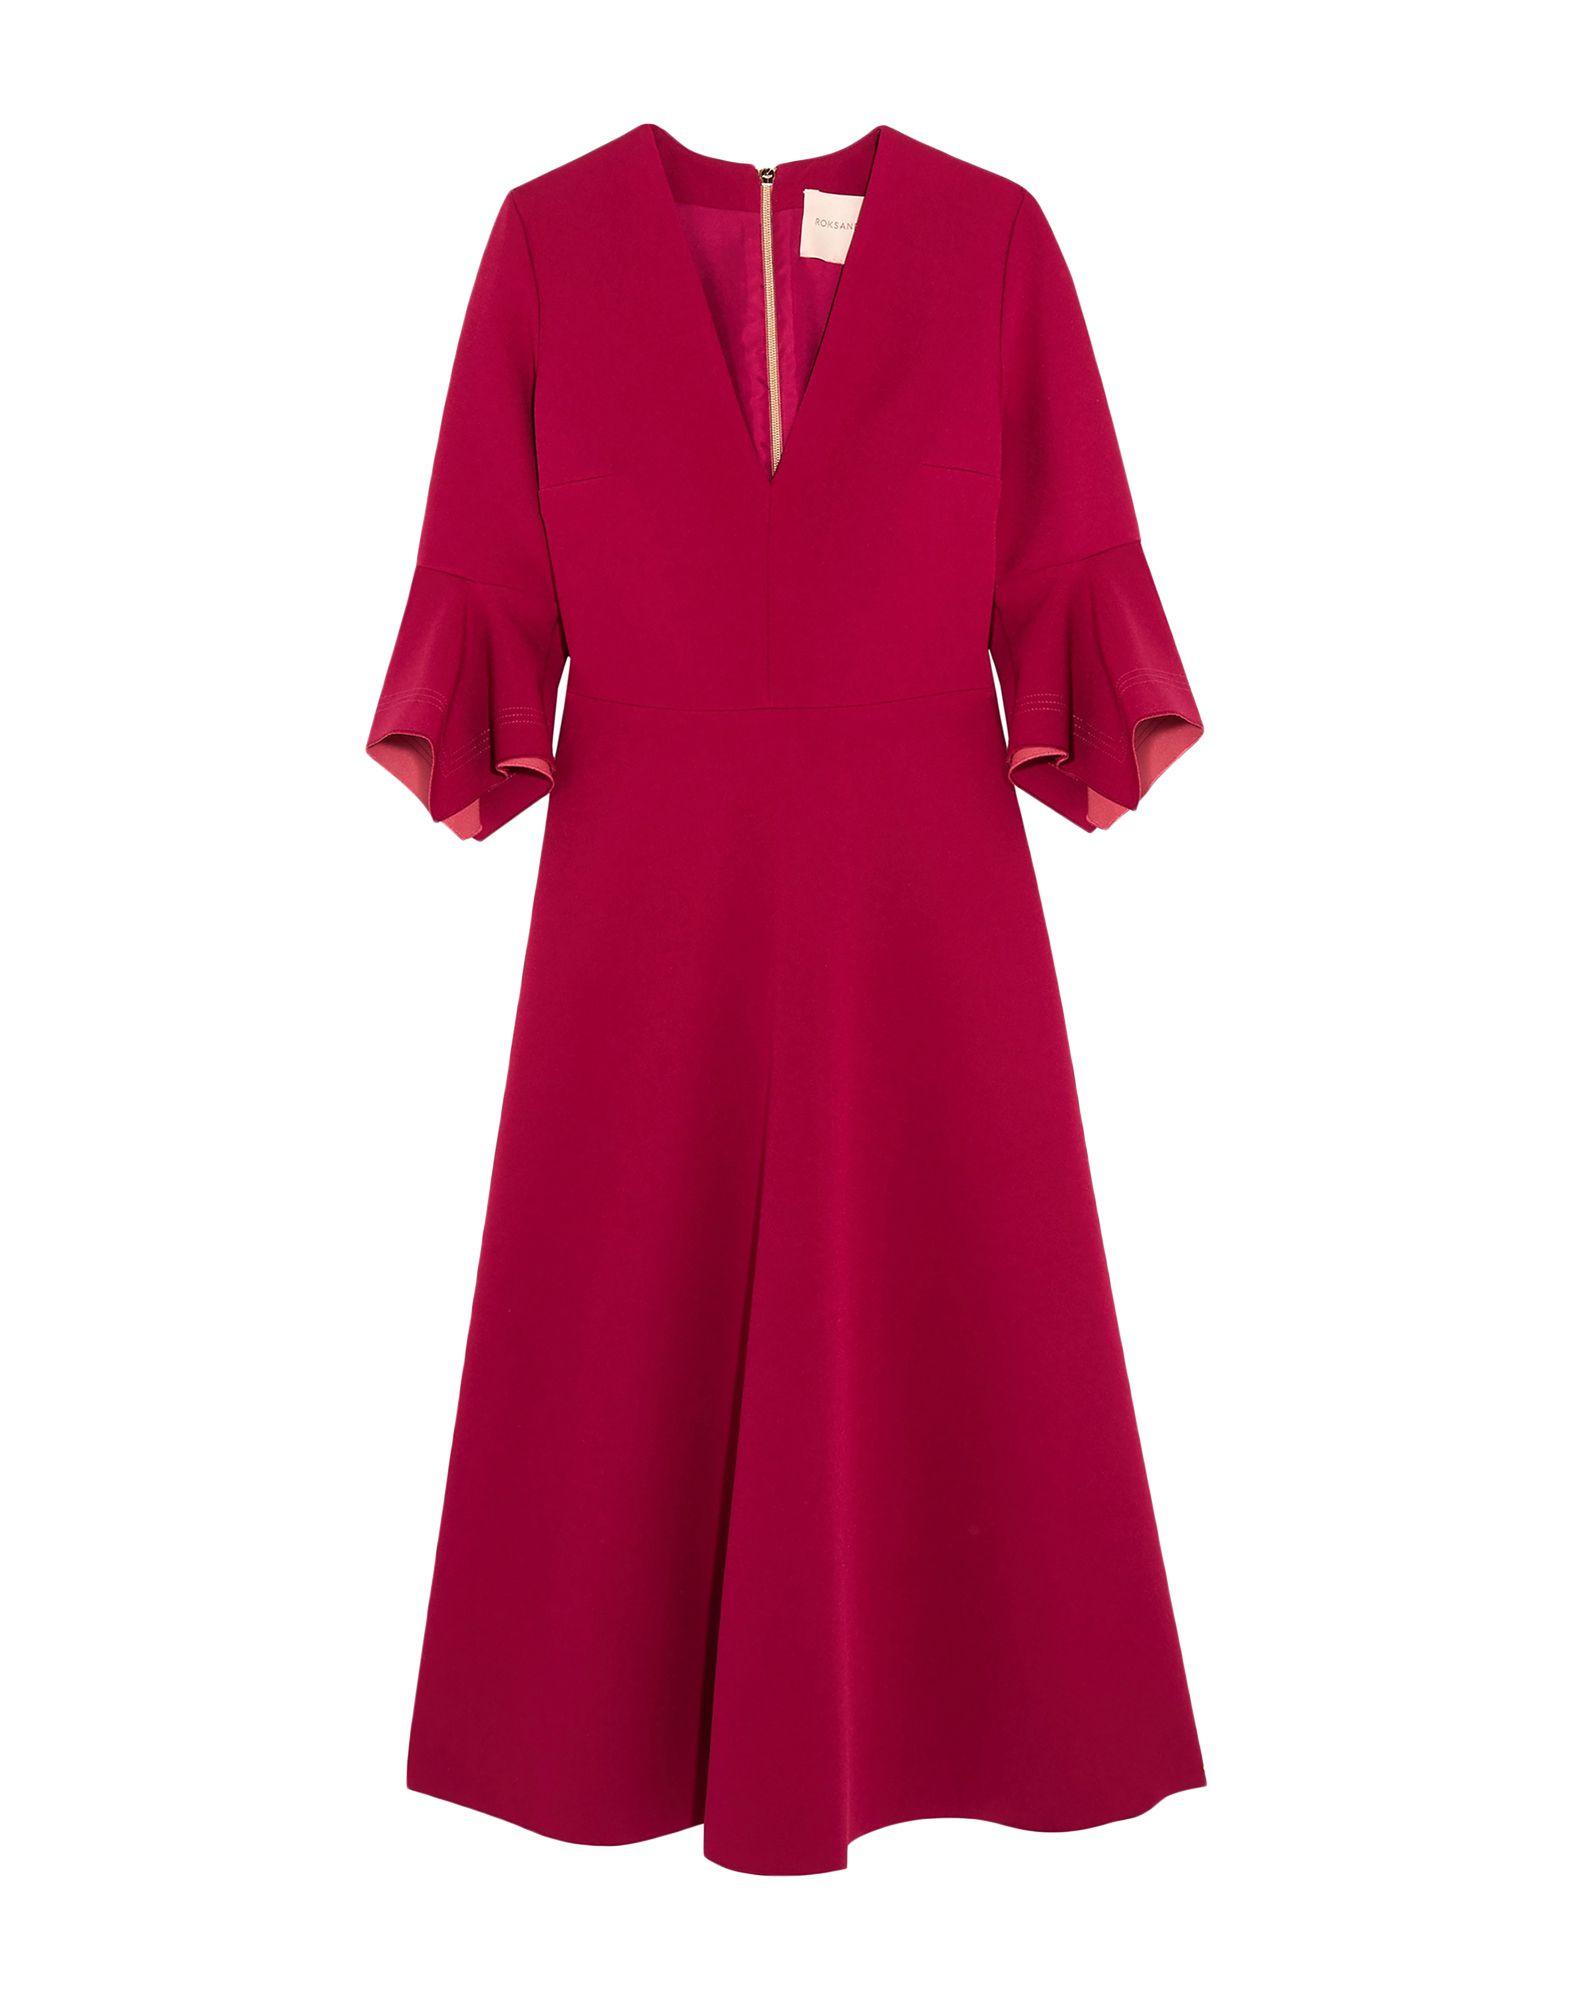 ROKSANDA Платье длиной 3/4 minimum платье длиной 3 4